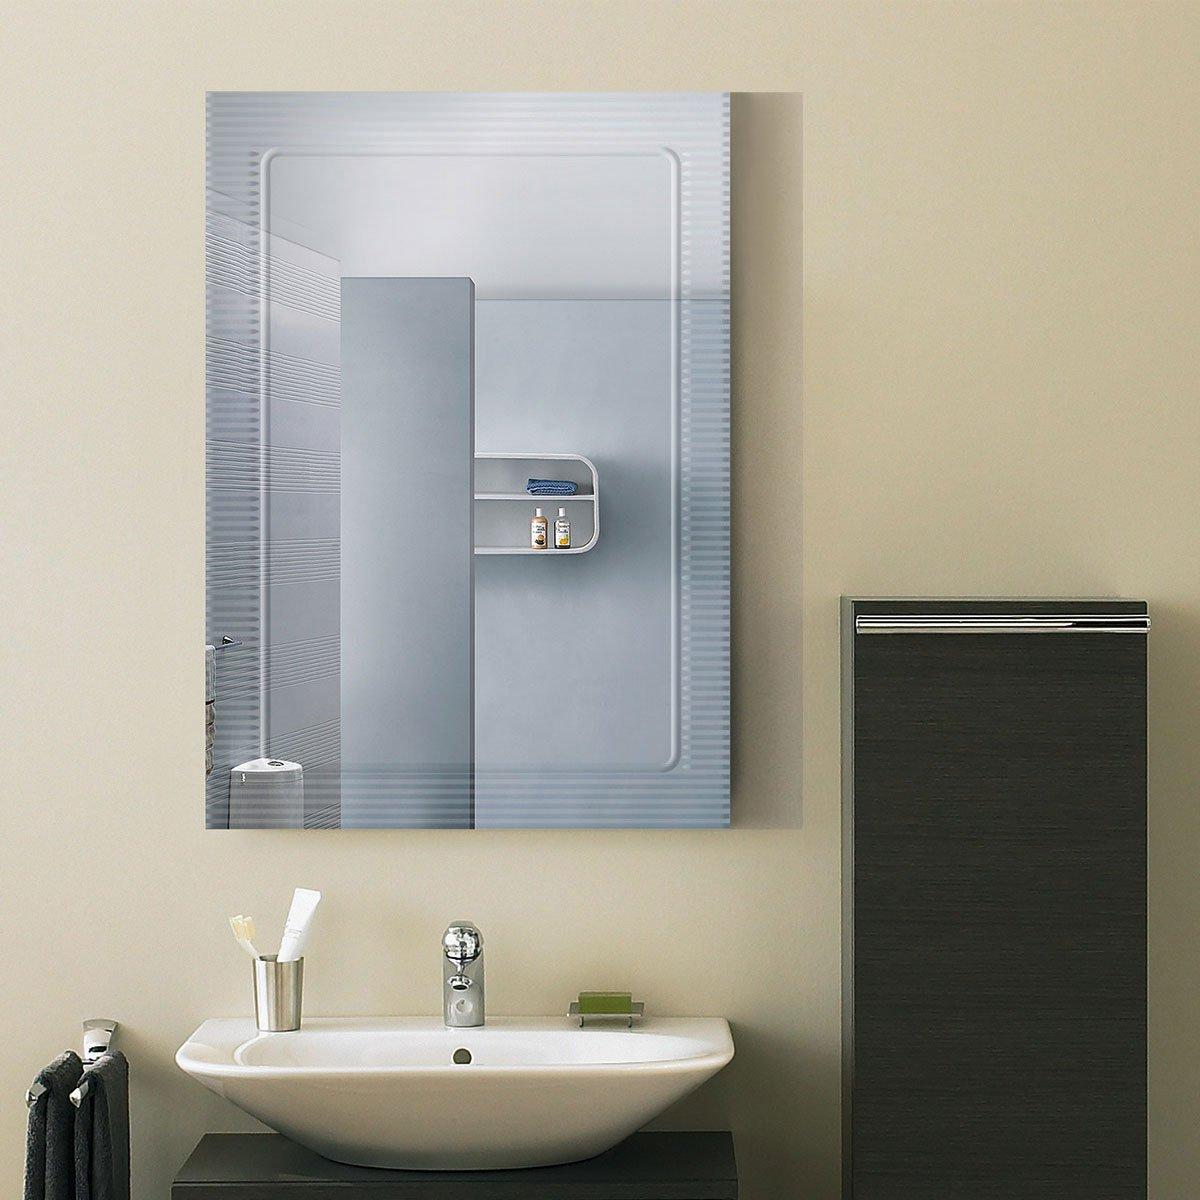 DECORAPORT 28''20'' Frameless Wall-mounted Bathroom Silvered Mirror Rectangle Vertical Vanity Mirror (A-B067B)